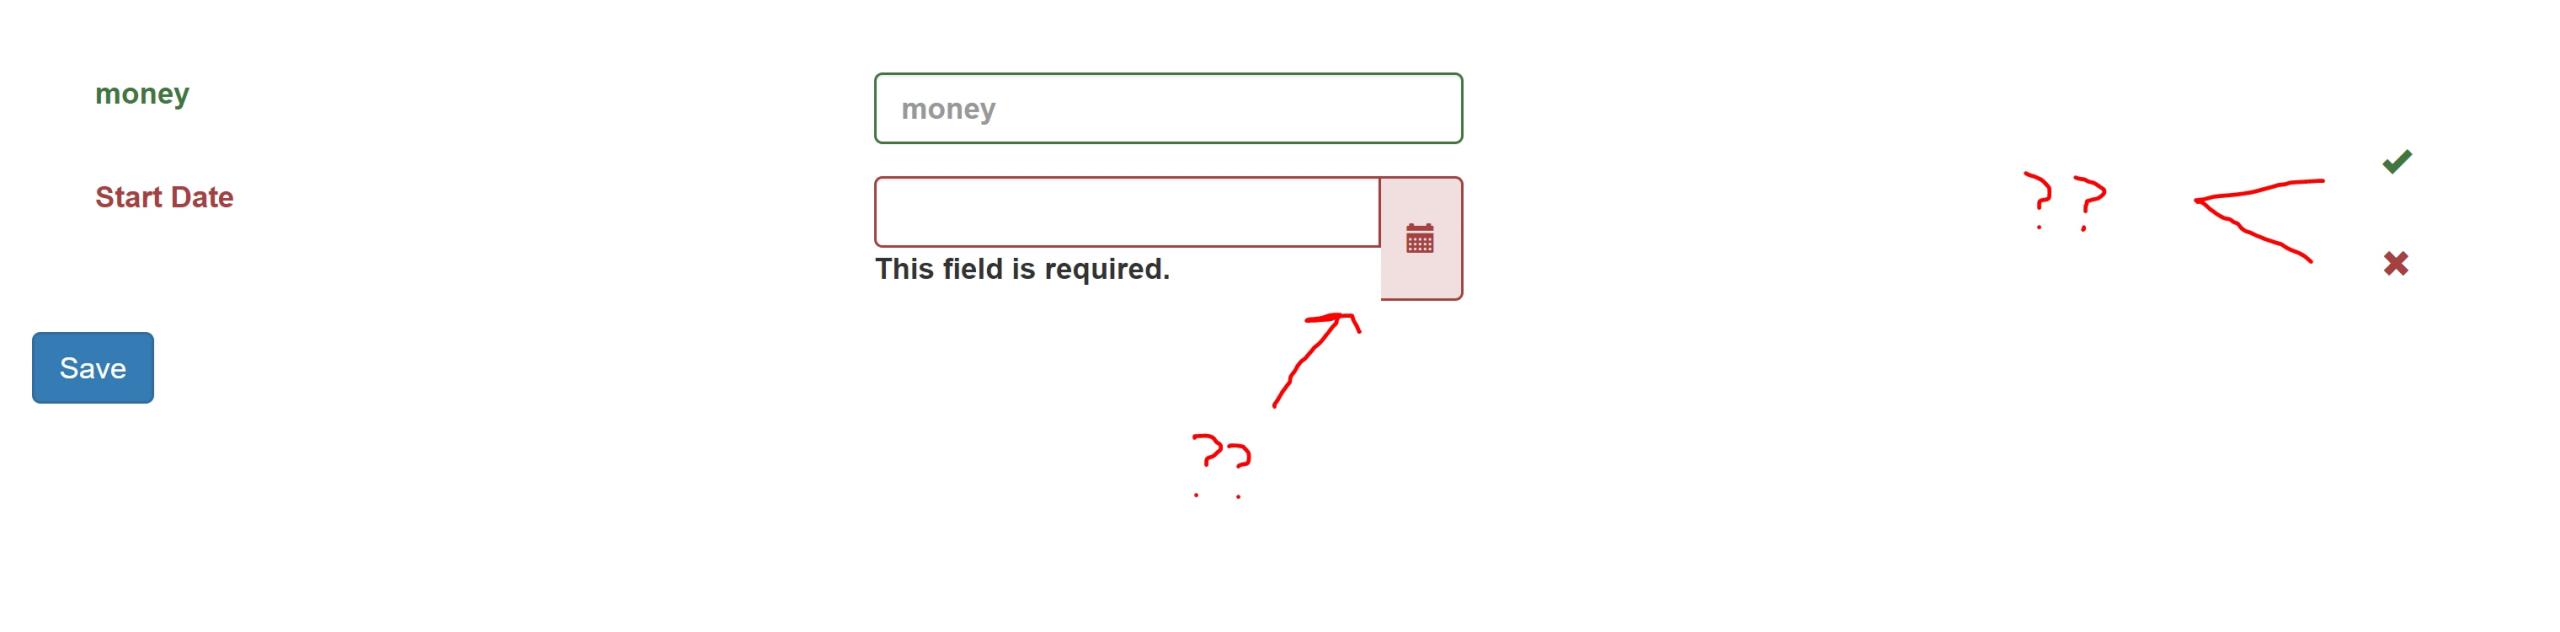 Calendar Icon Inside Textbox Bootstrap | Calendar For Planning